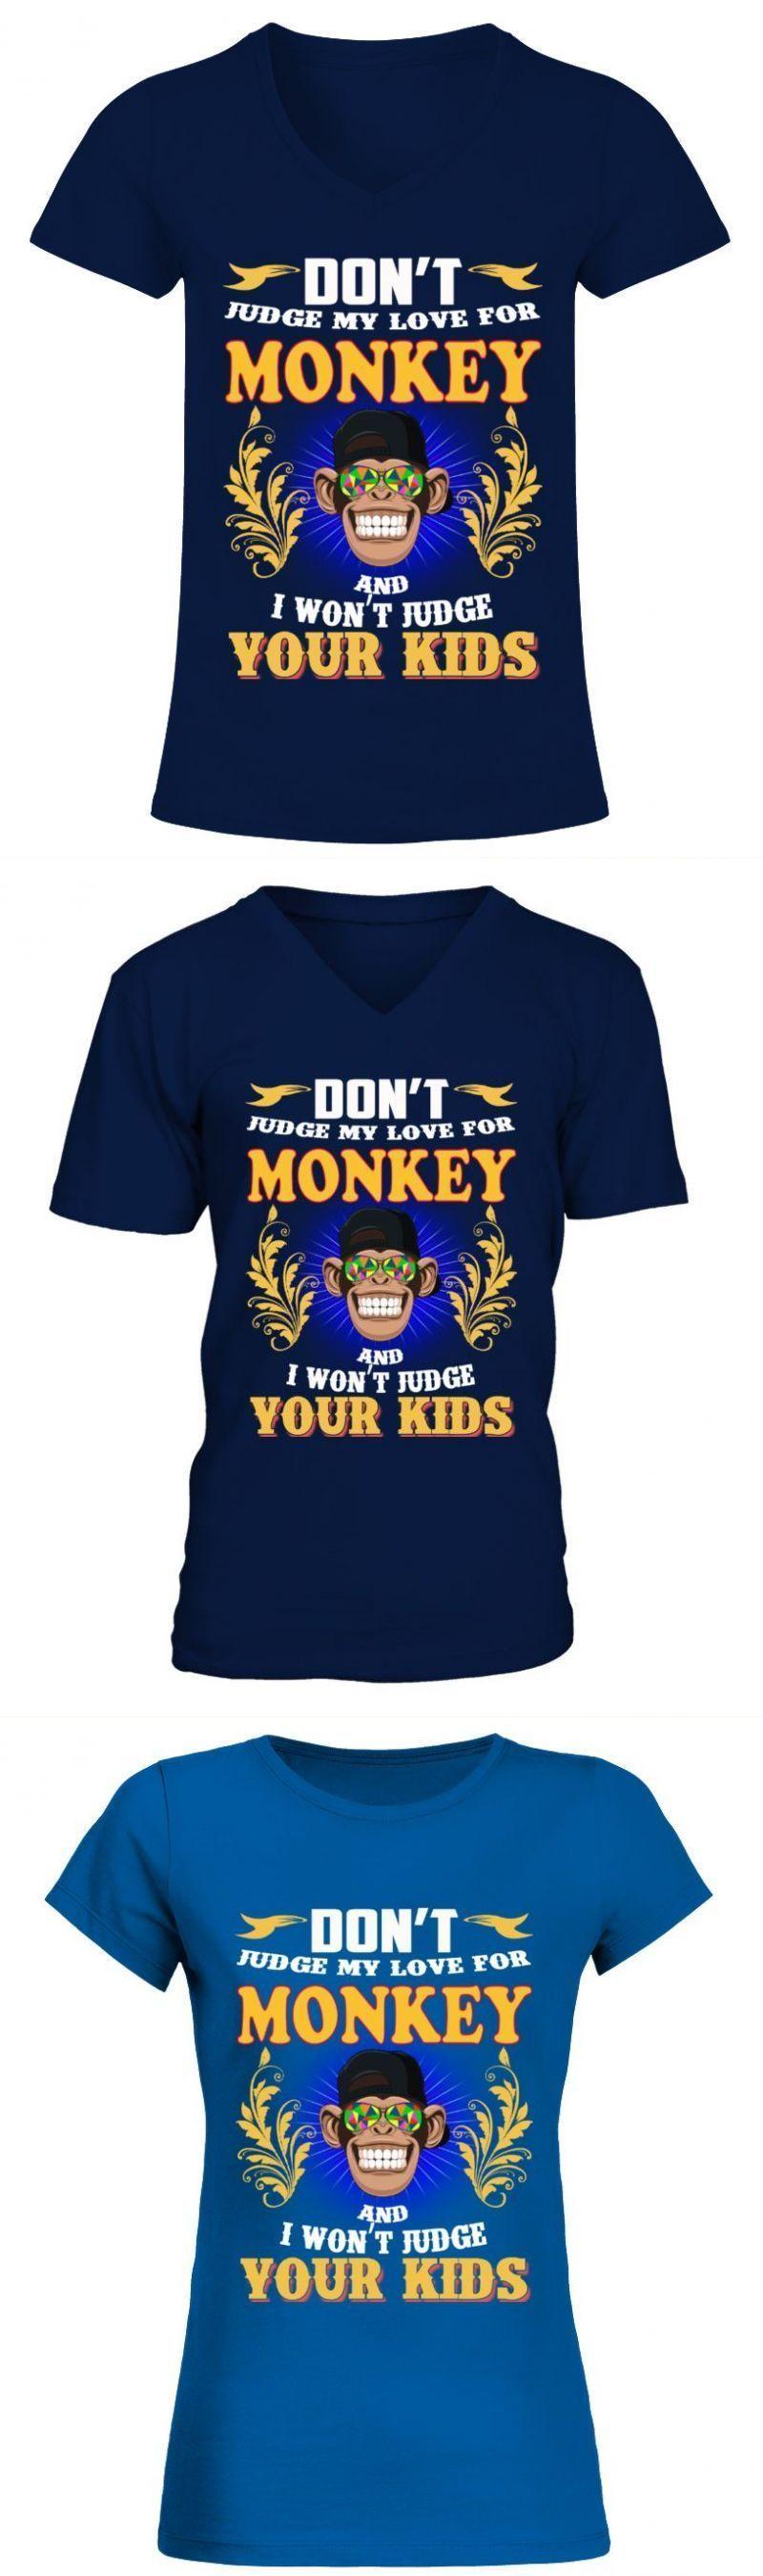 Monkey t-shirt for kids don't judge my love monkey gas monkey garage t shirt #gasmonkeygarage Monkey t-shirt for kids don't judge my love monkey gas monkey garage t shirt #monkey #t-shirt #for #kids #don't #judge #my #love #gas #garage #shirt #artic #monkeys #women #v-neck #woman #unisex #round #neck #gasmonkeygarage